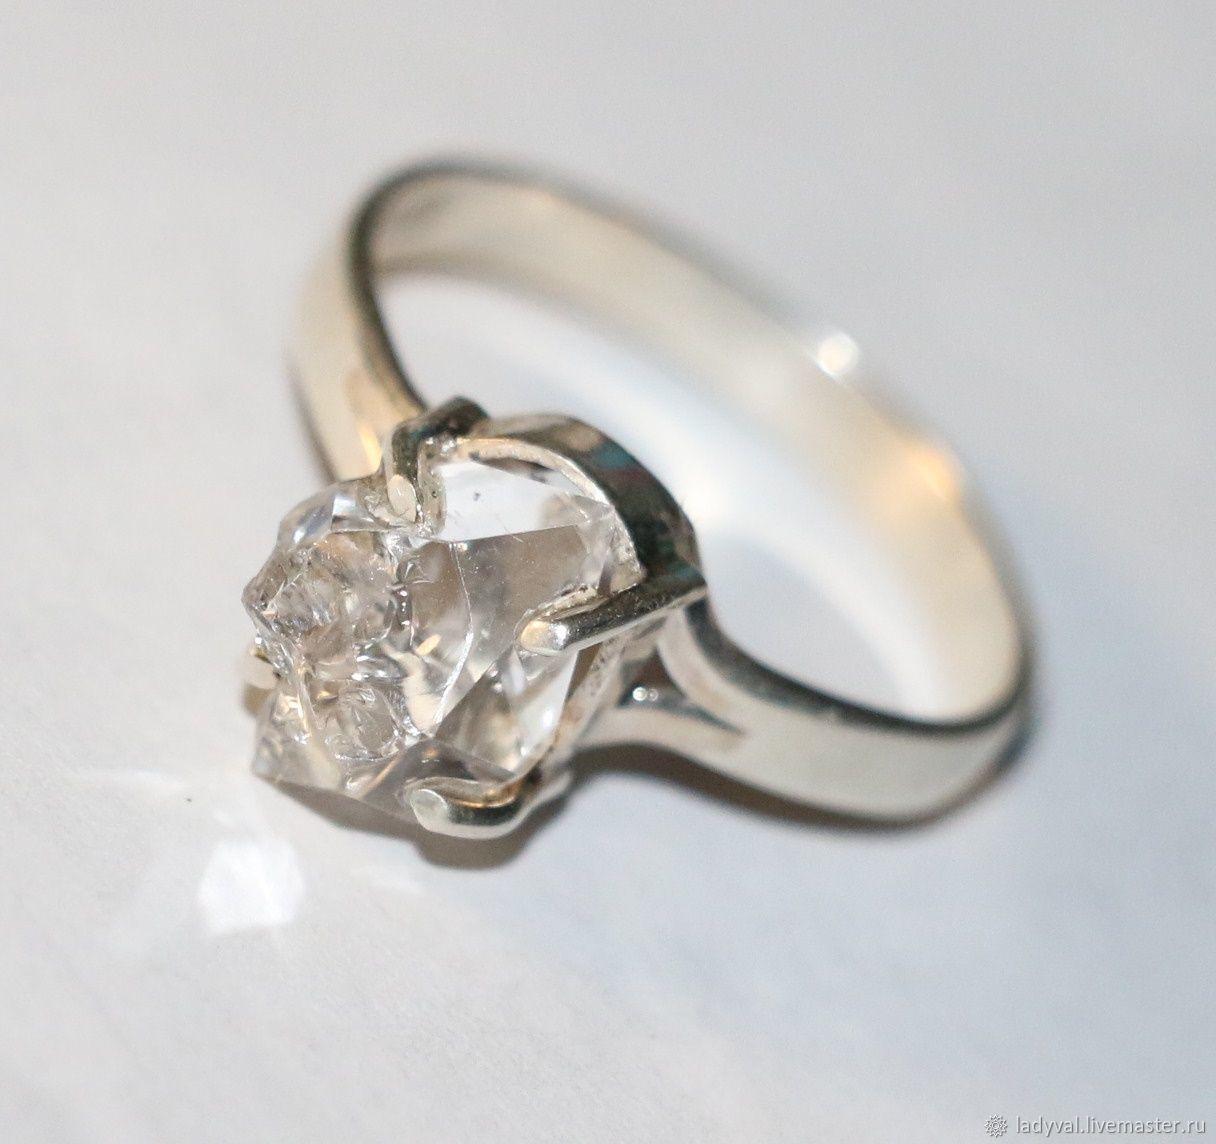 бриллиант геркмайера алмаз херкимера серебро 925, Кольца, Москва,  Фото №1